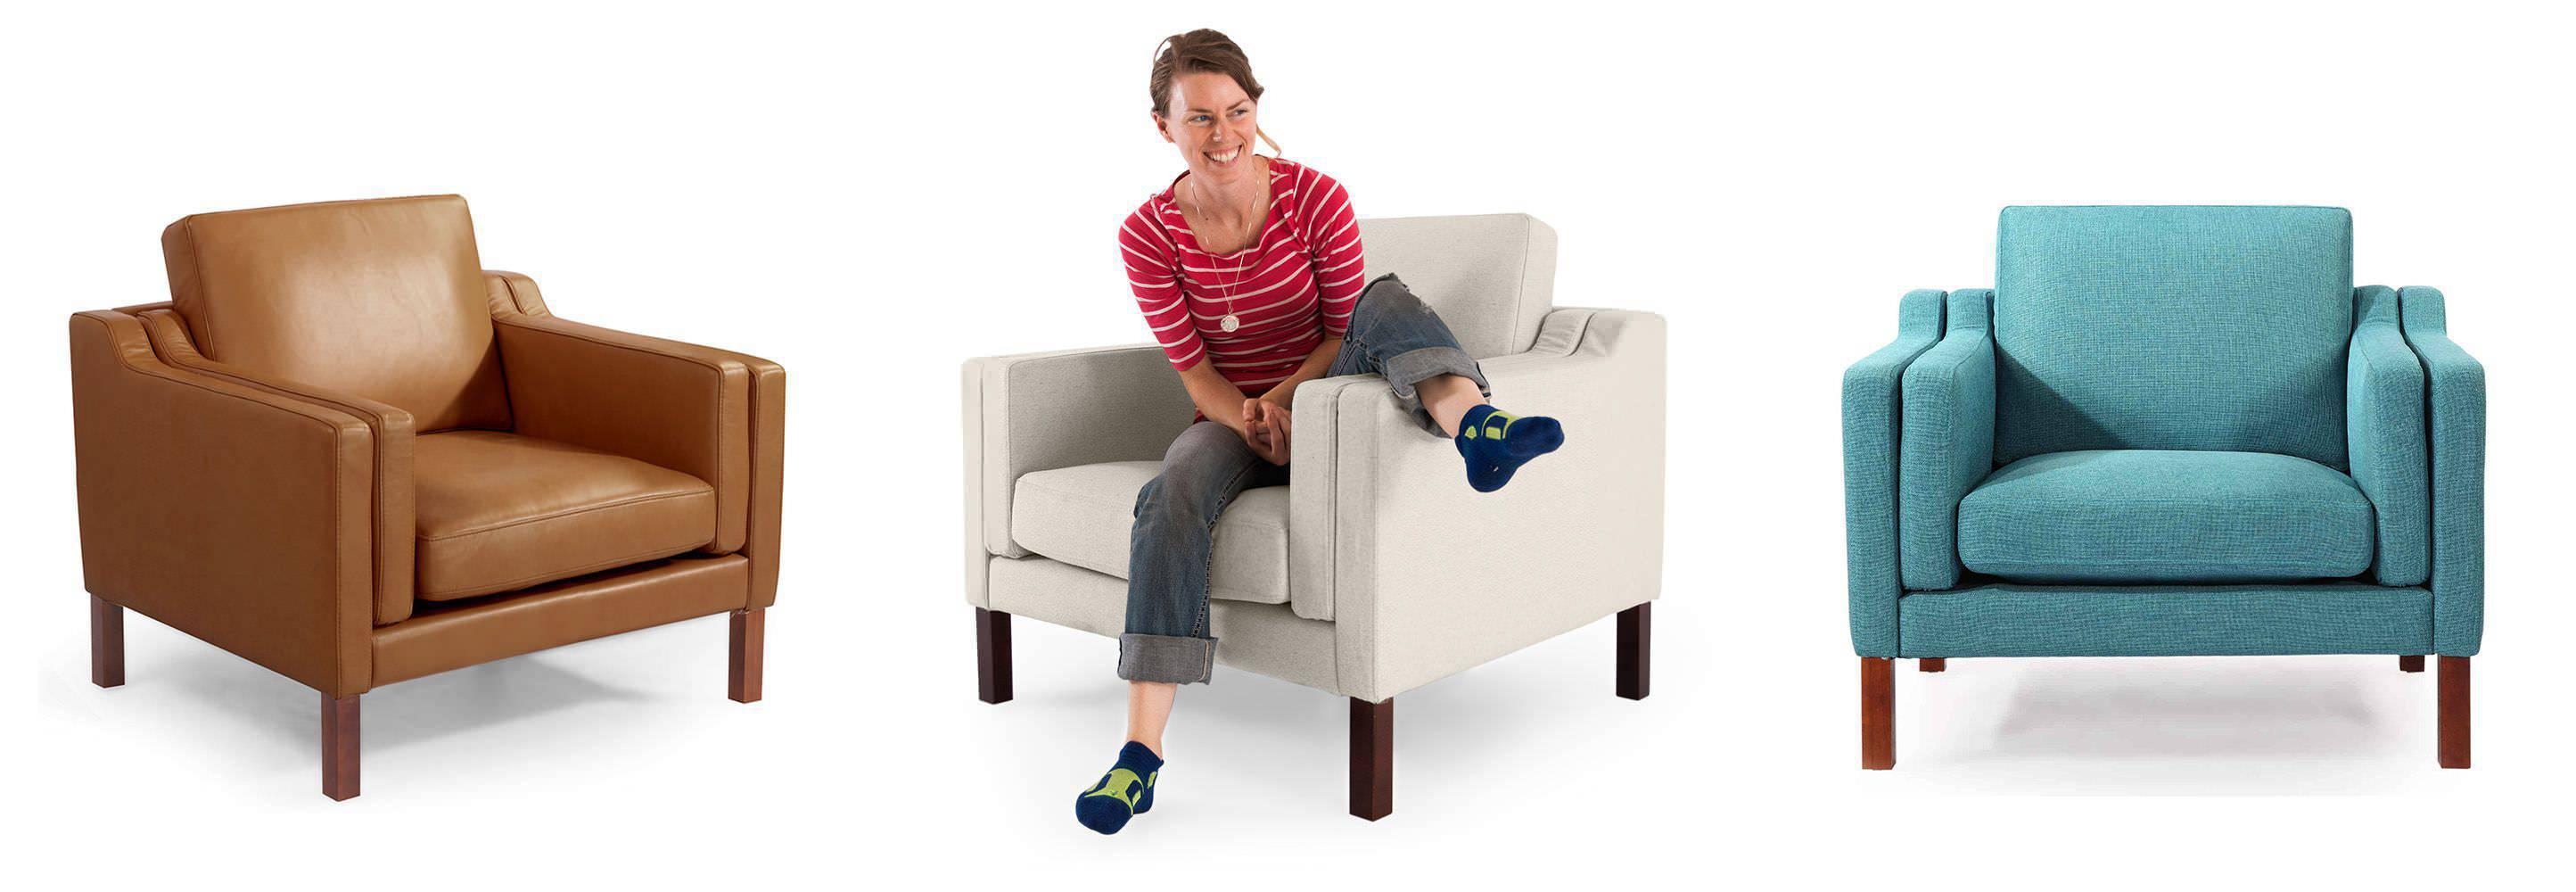 Monroe club chair armchair modern mid century arm